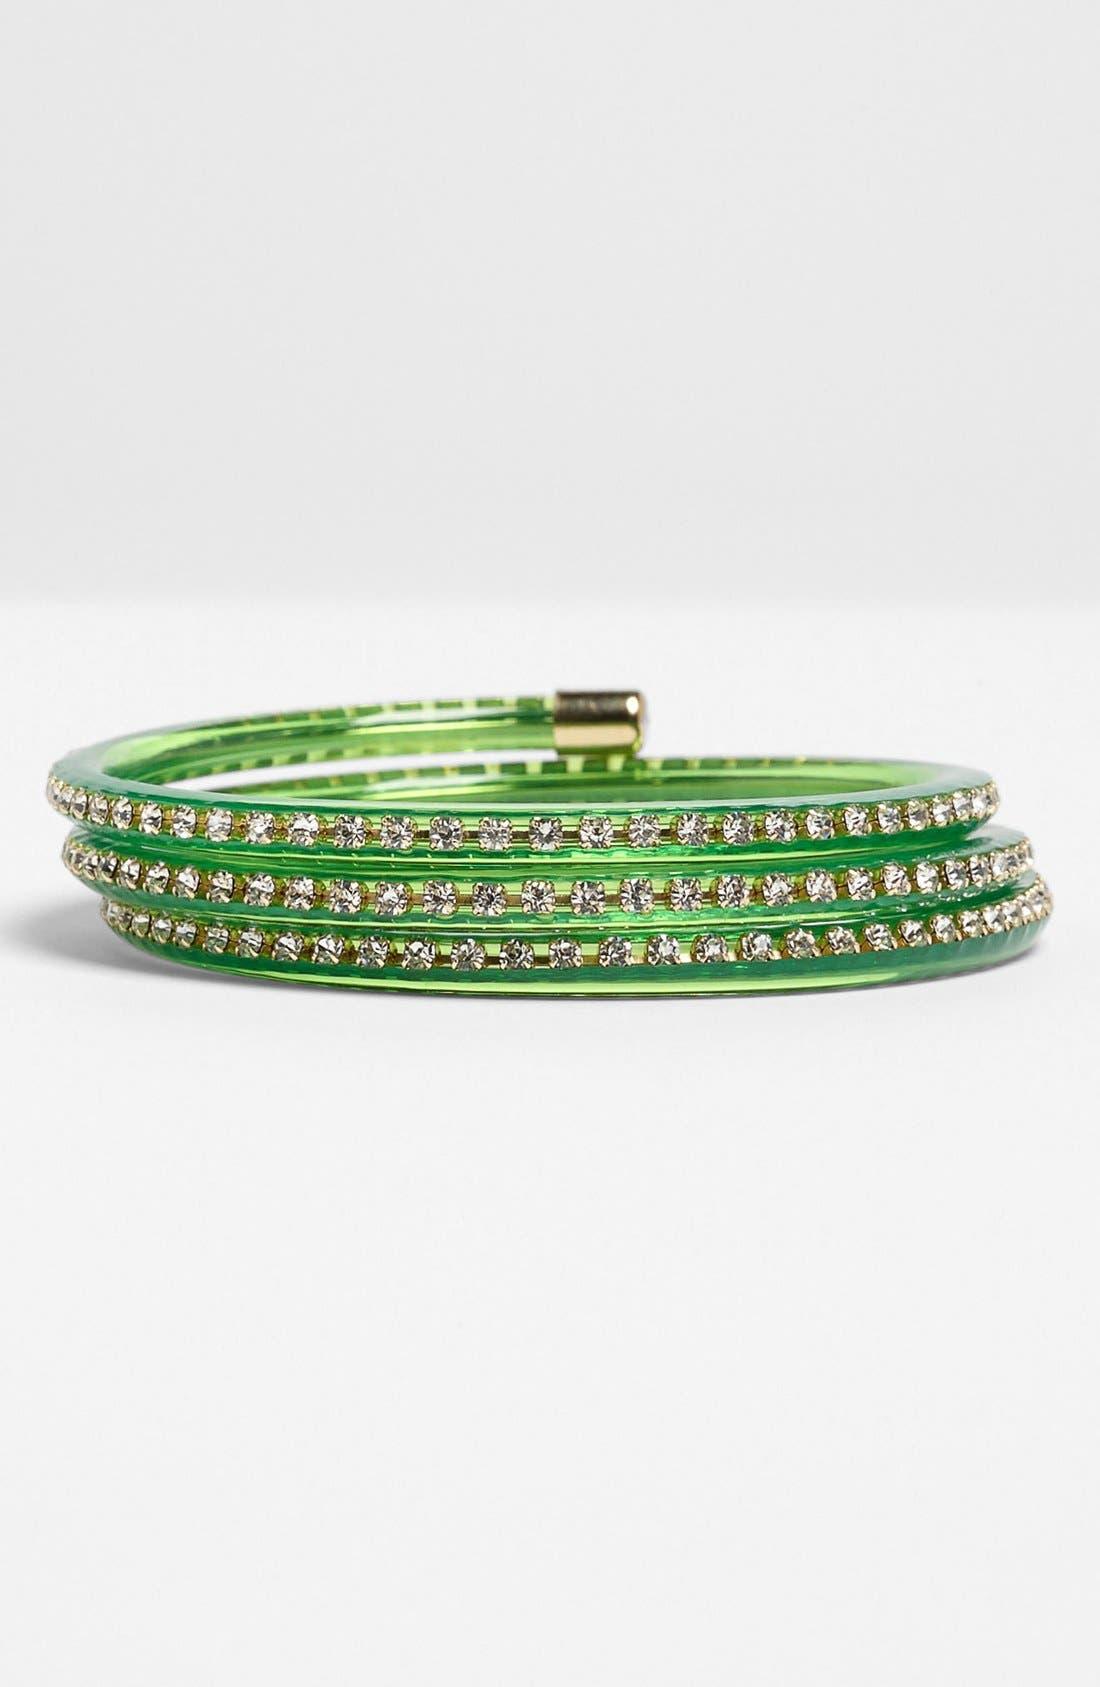 Alternate Image 1 Selected - MARC BY MARC JACOBS 'Slinky' Coil Bracelet